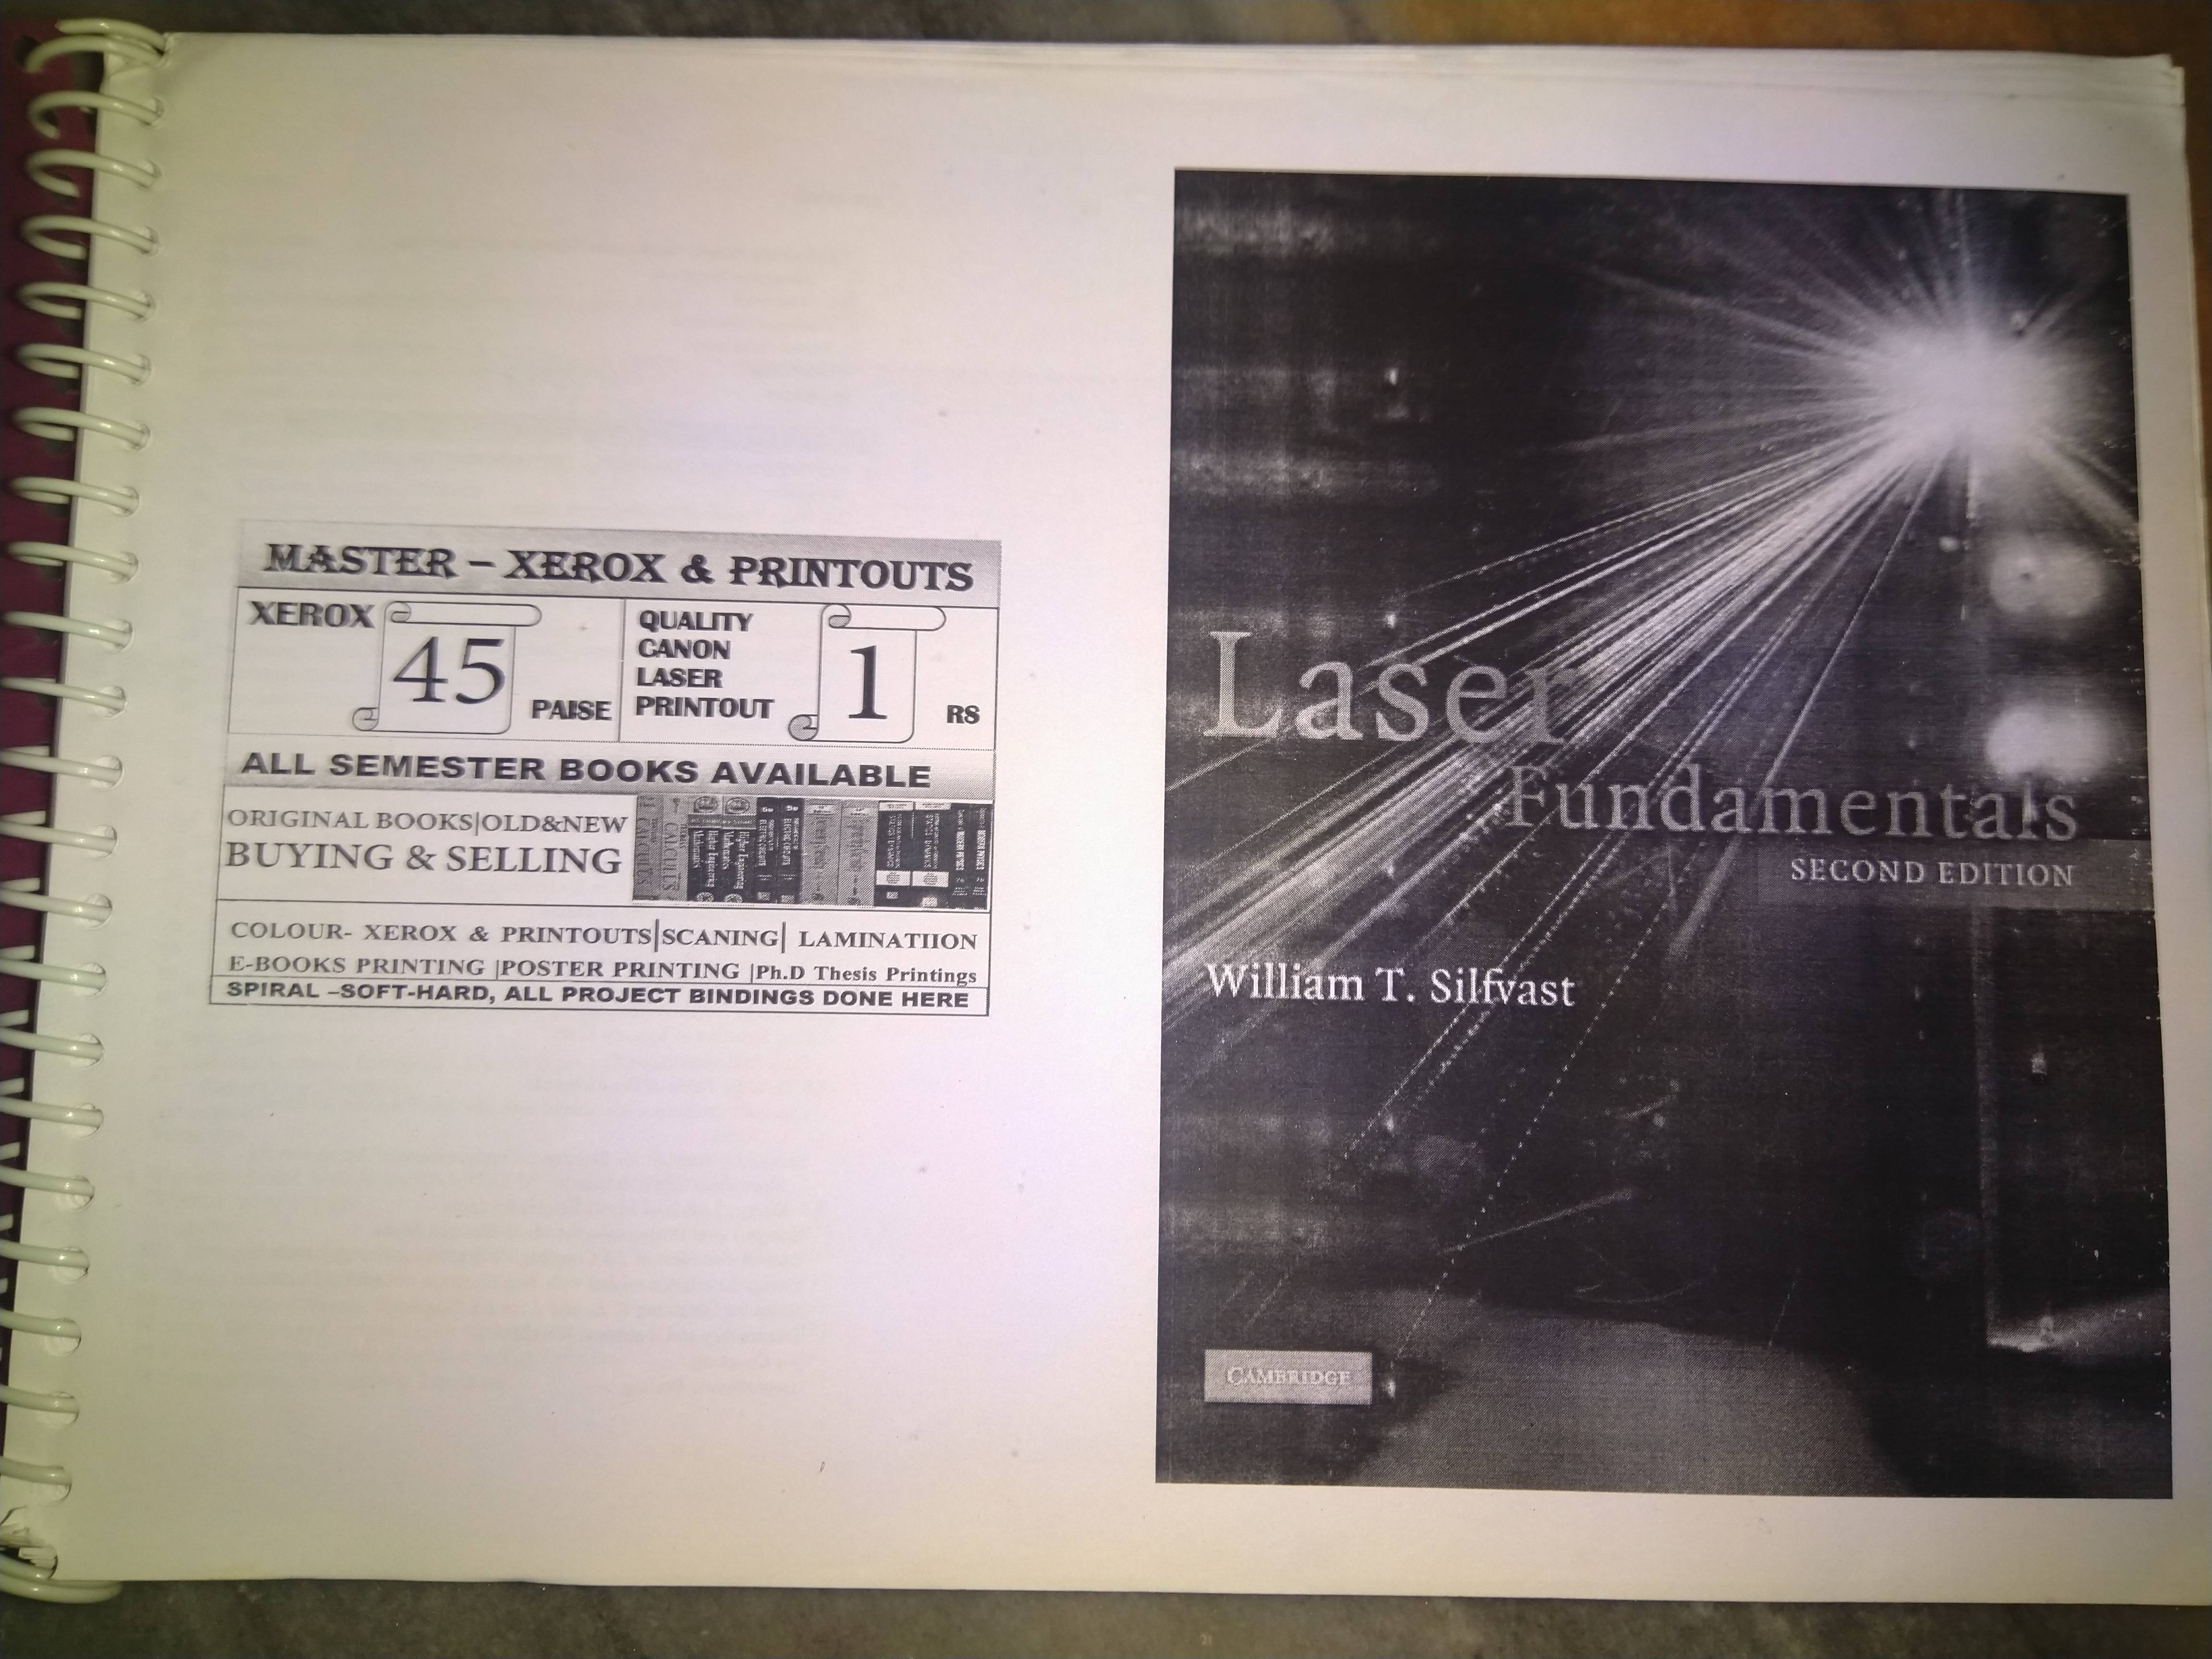 Laser fundamentals 2nd Edition, William T.Silfvast (Cambridge)